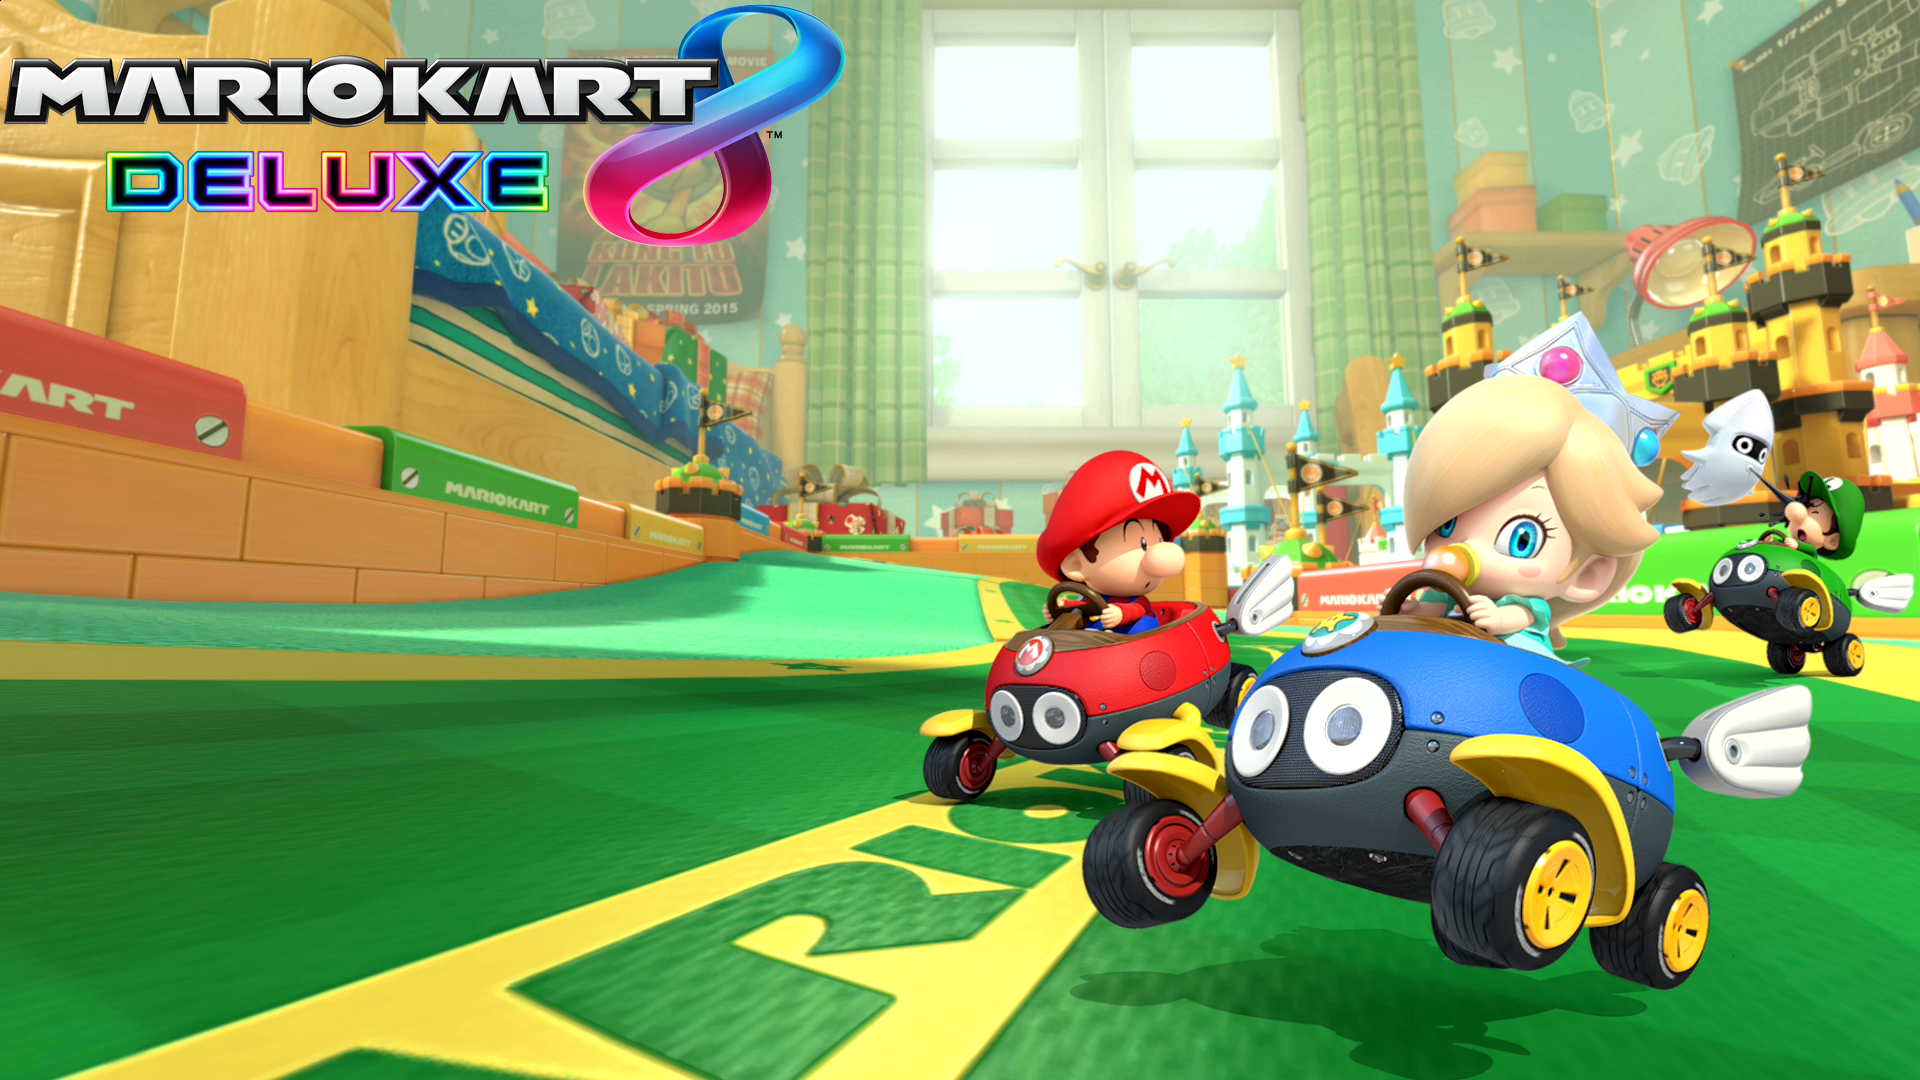 Mario Kart 8 Background: Mario Kart 8 Deluxe Baby Mario, Baby Luigi & Baby Rosalina